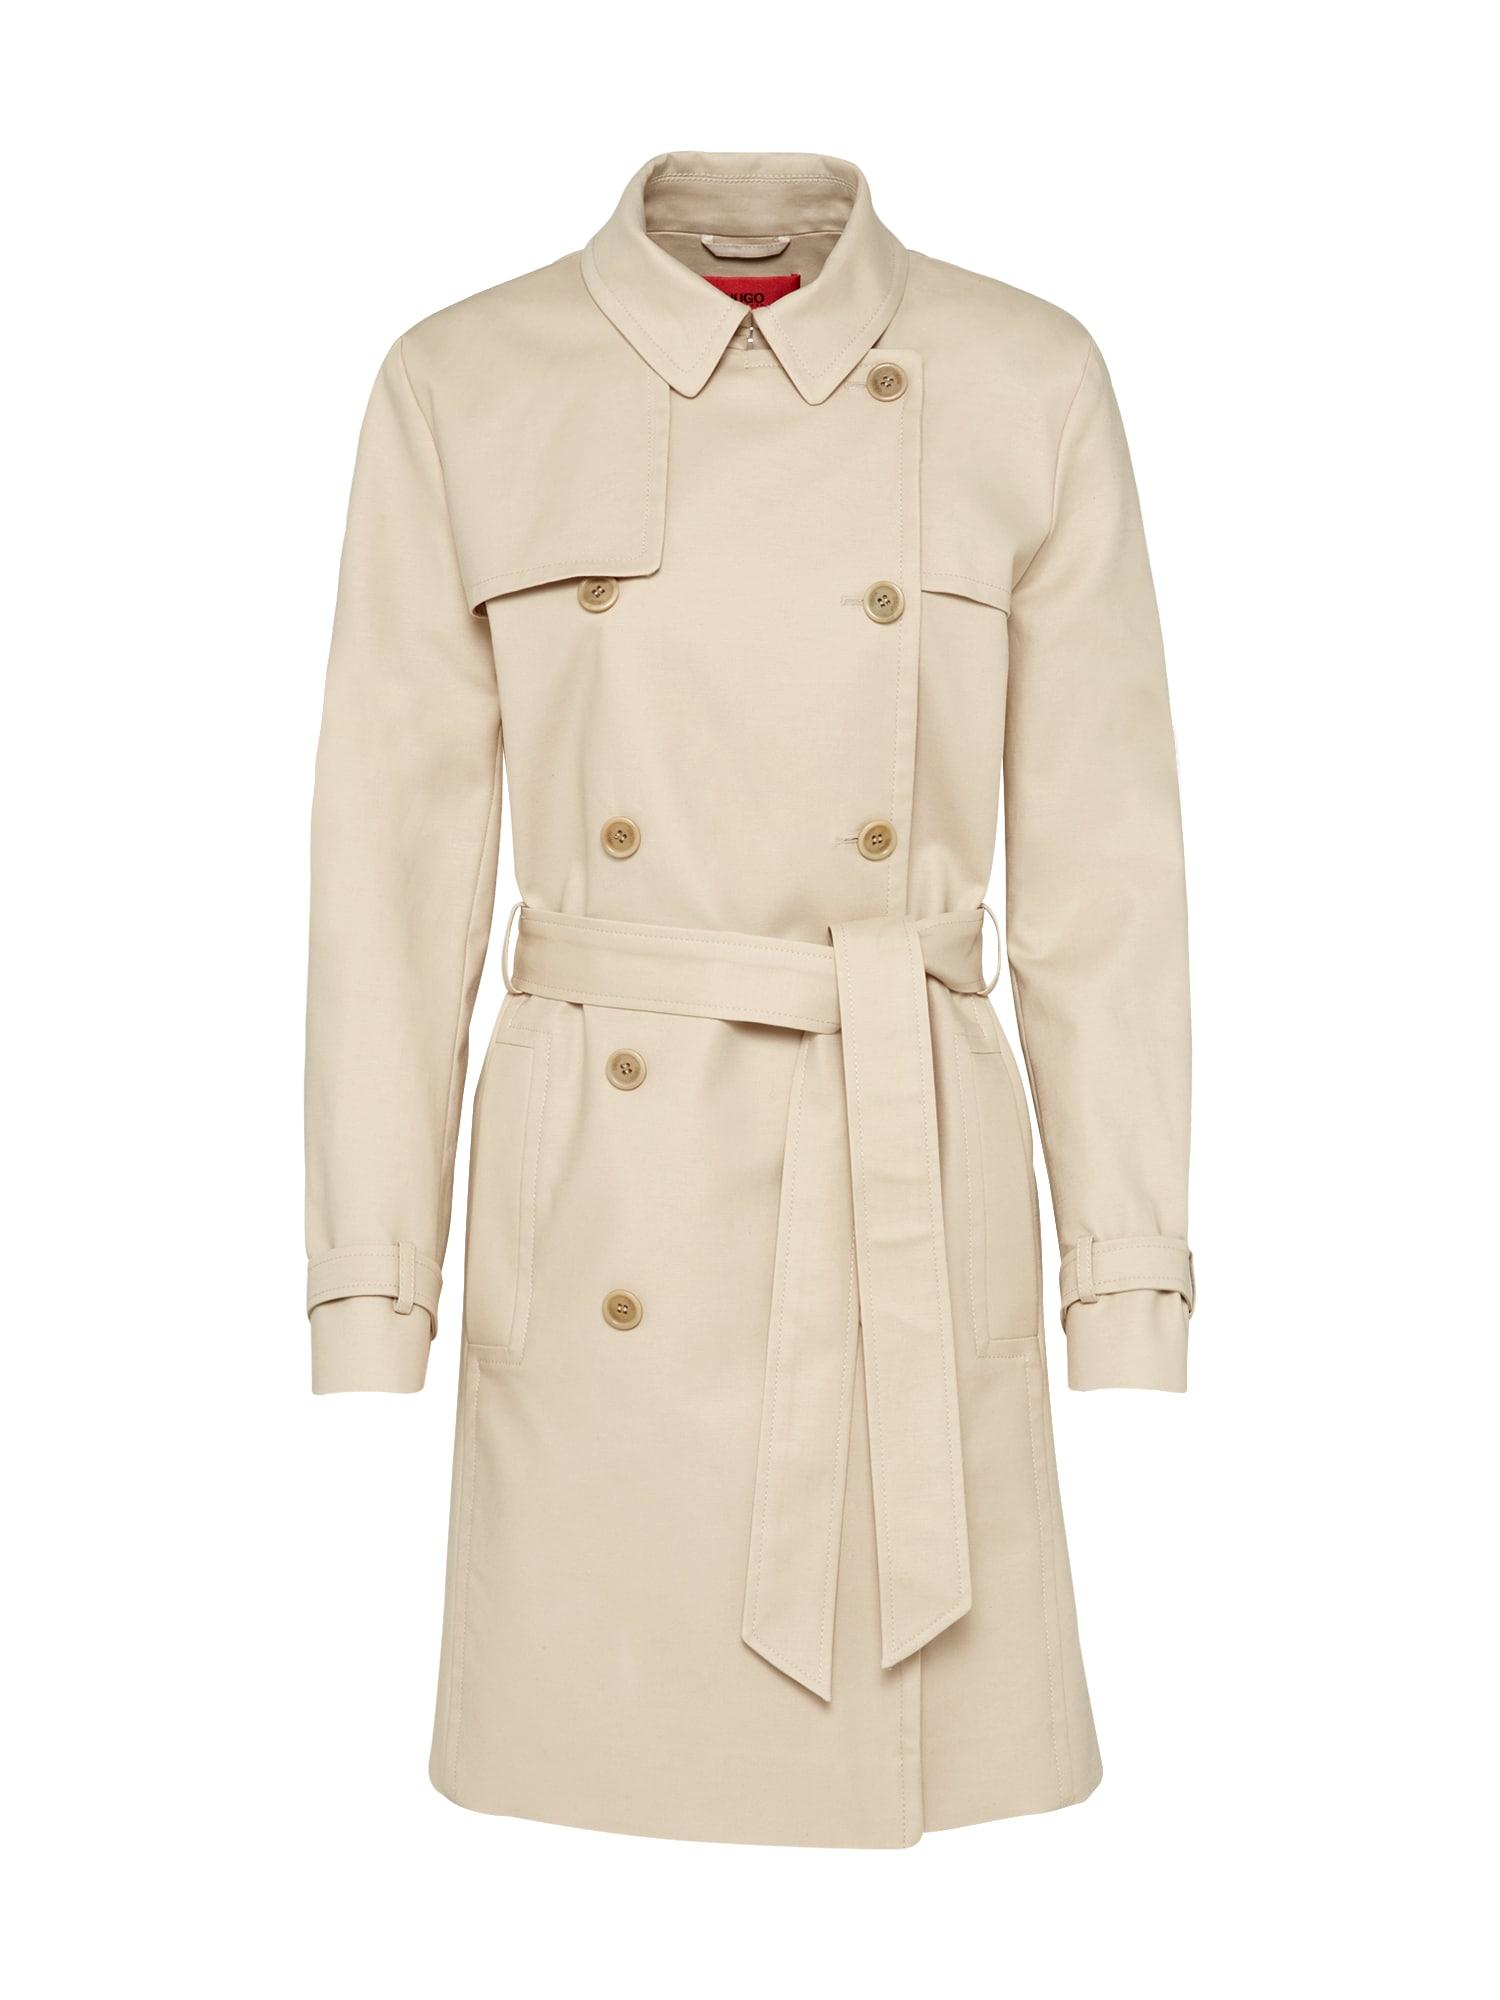 Přechodný kabát Makaras hellbeige HUGO